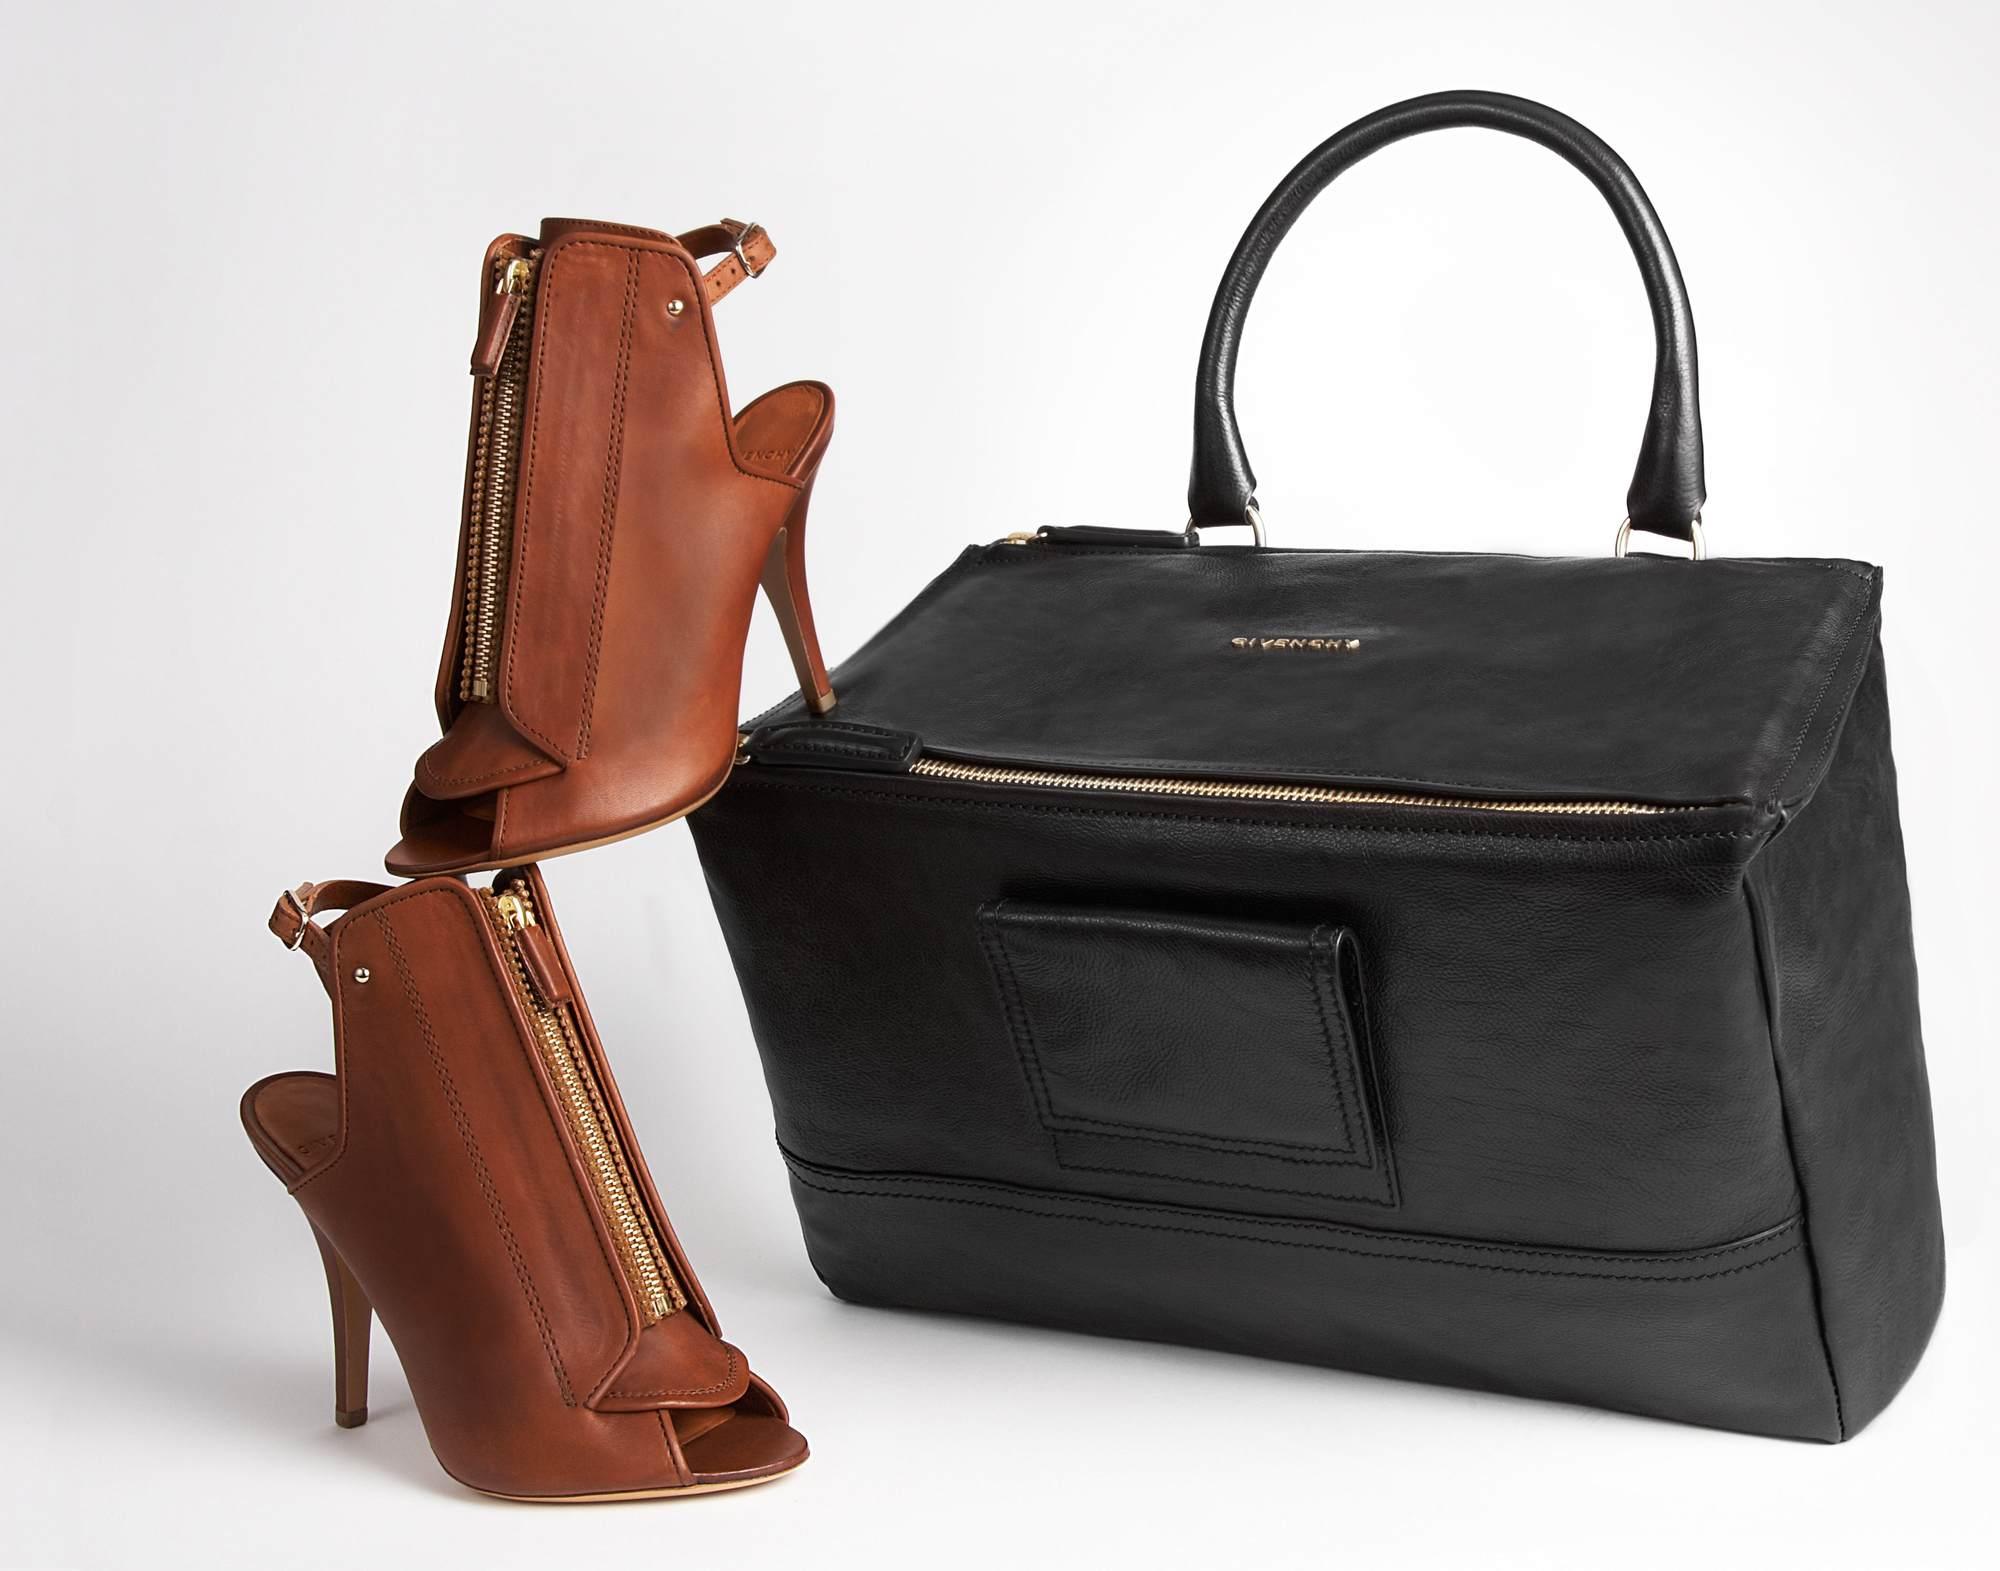 Givenchy_fashion_photography.jpg